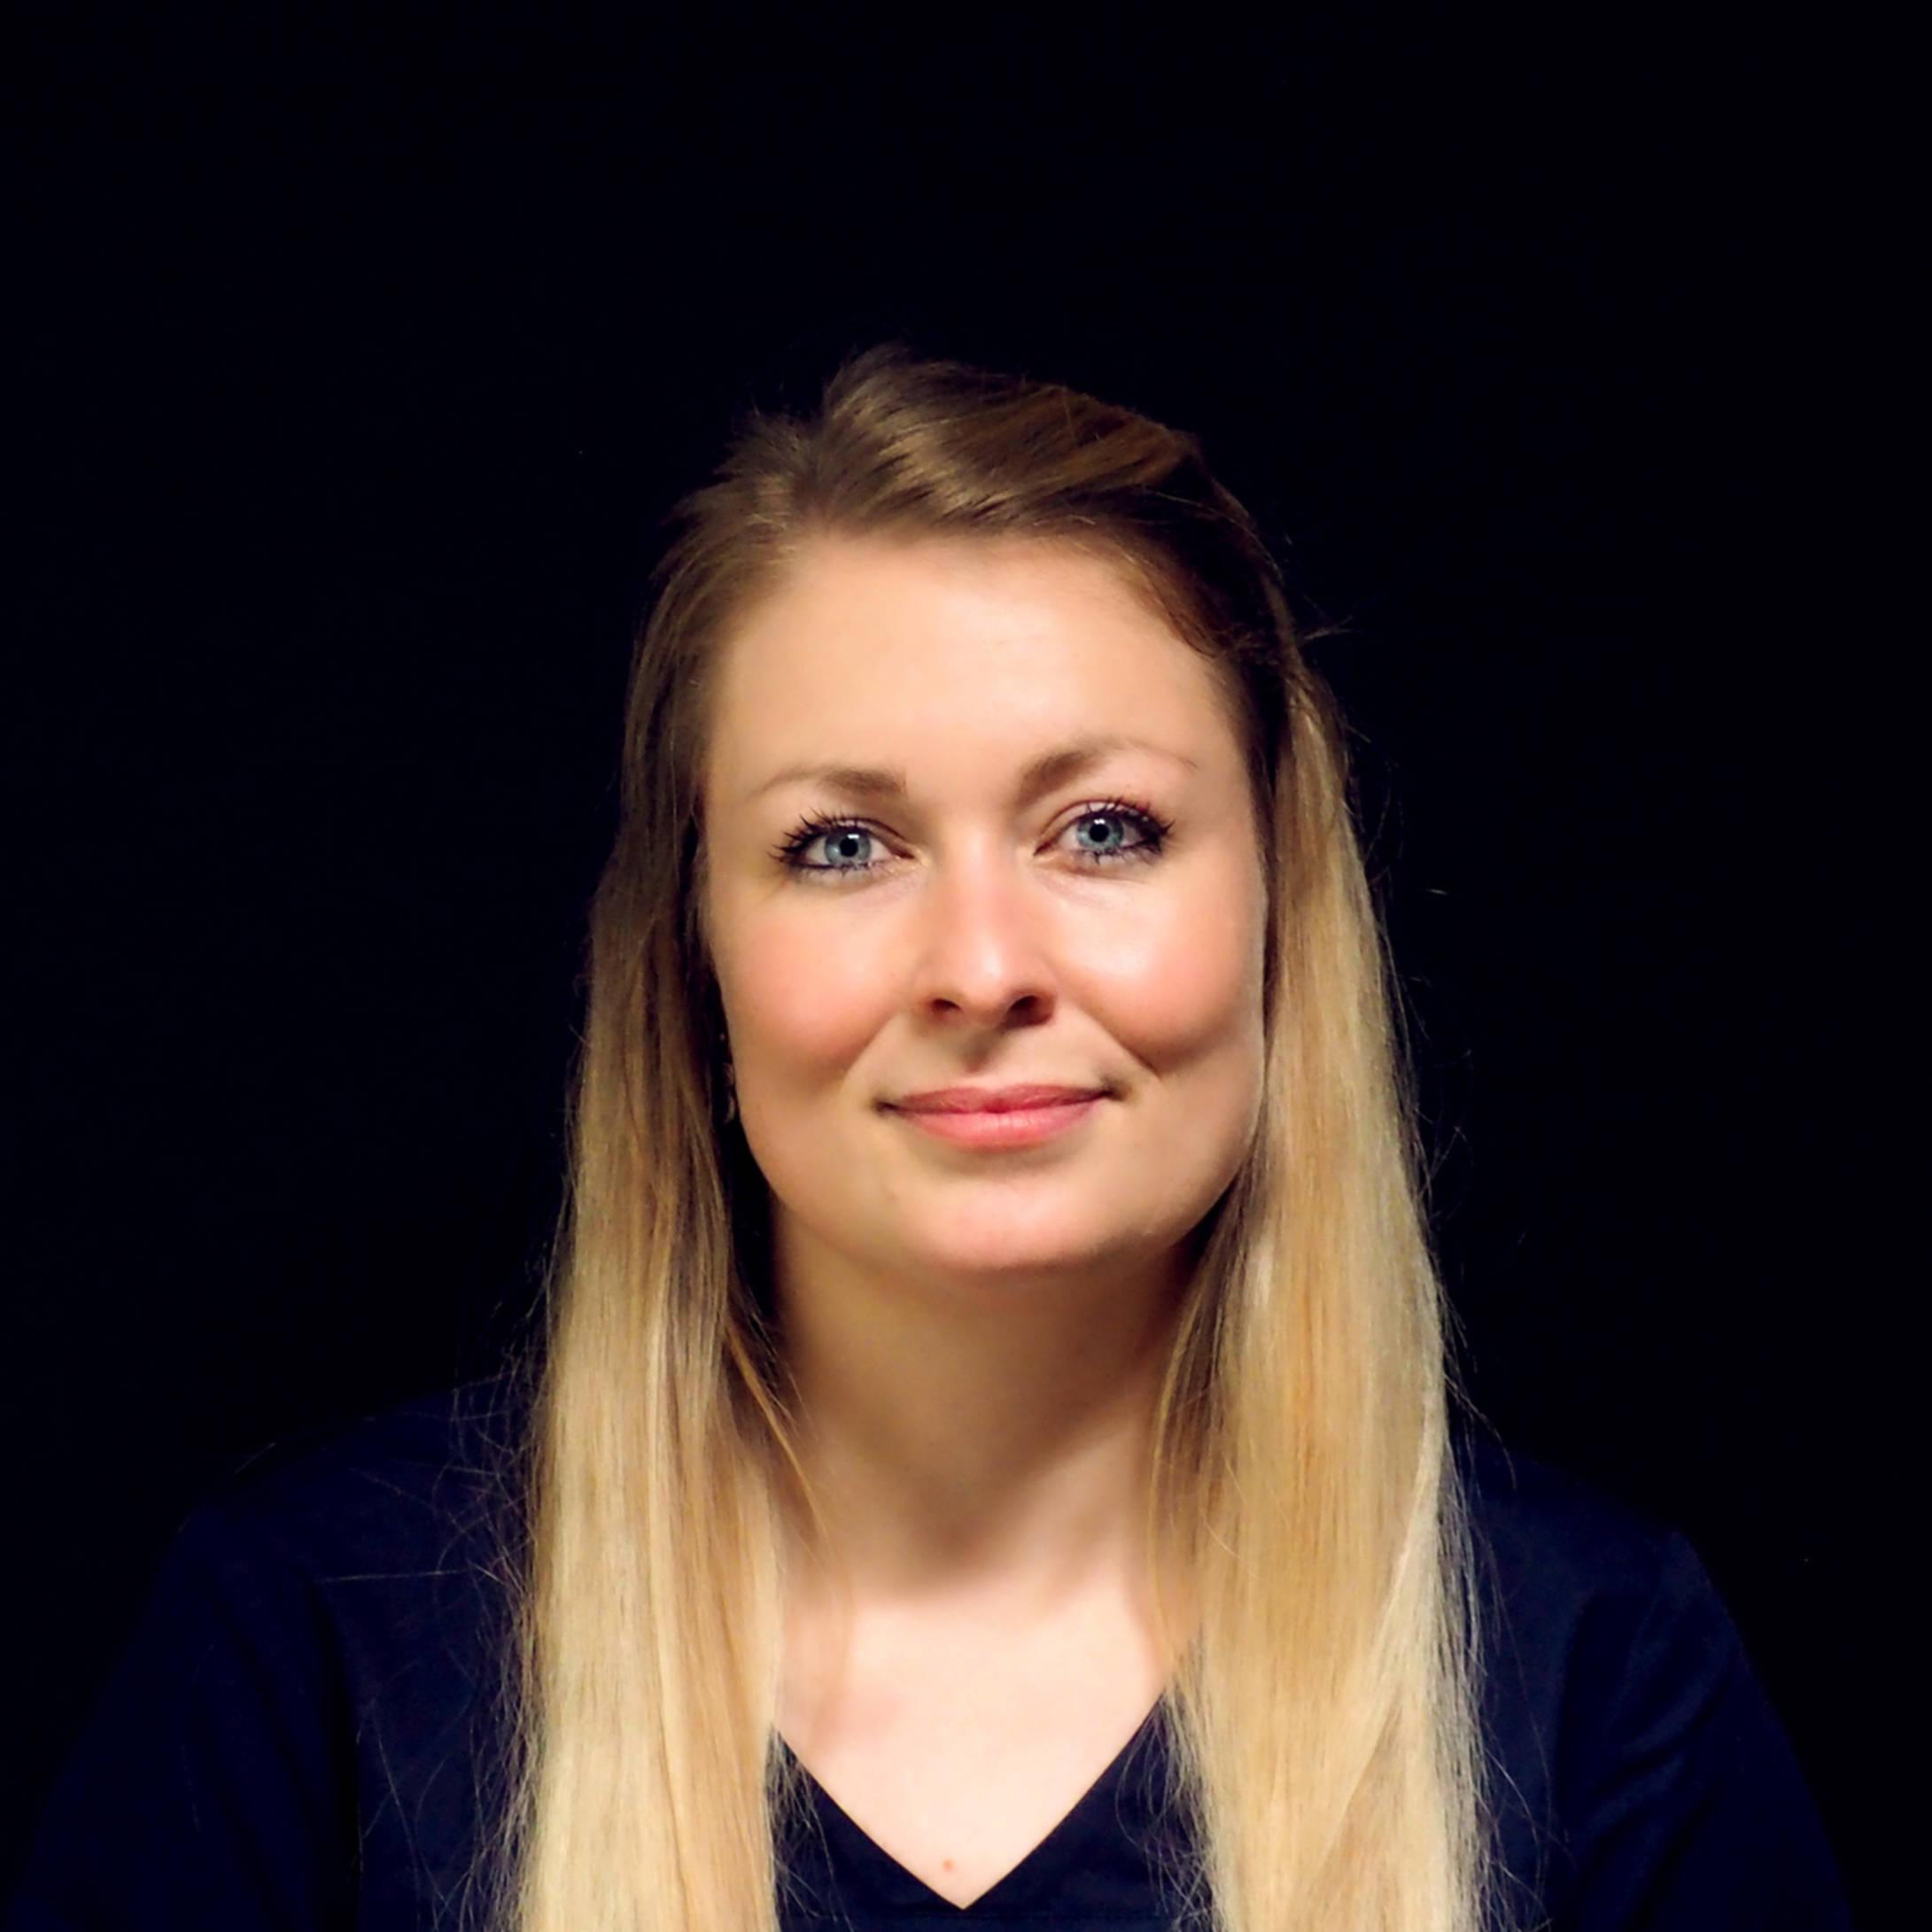 Charlotte PERRAIN